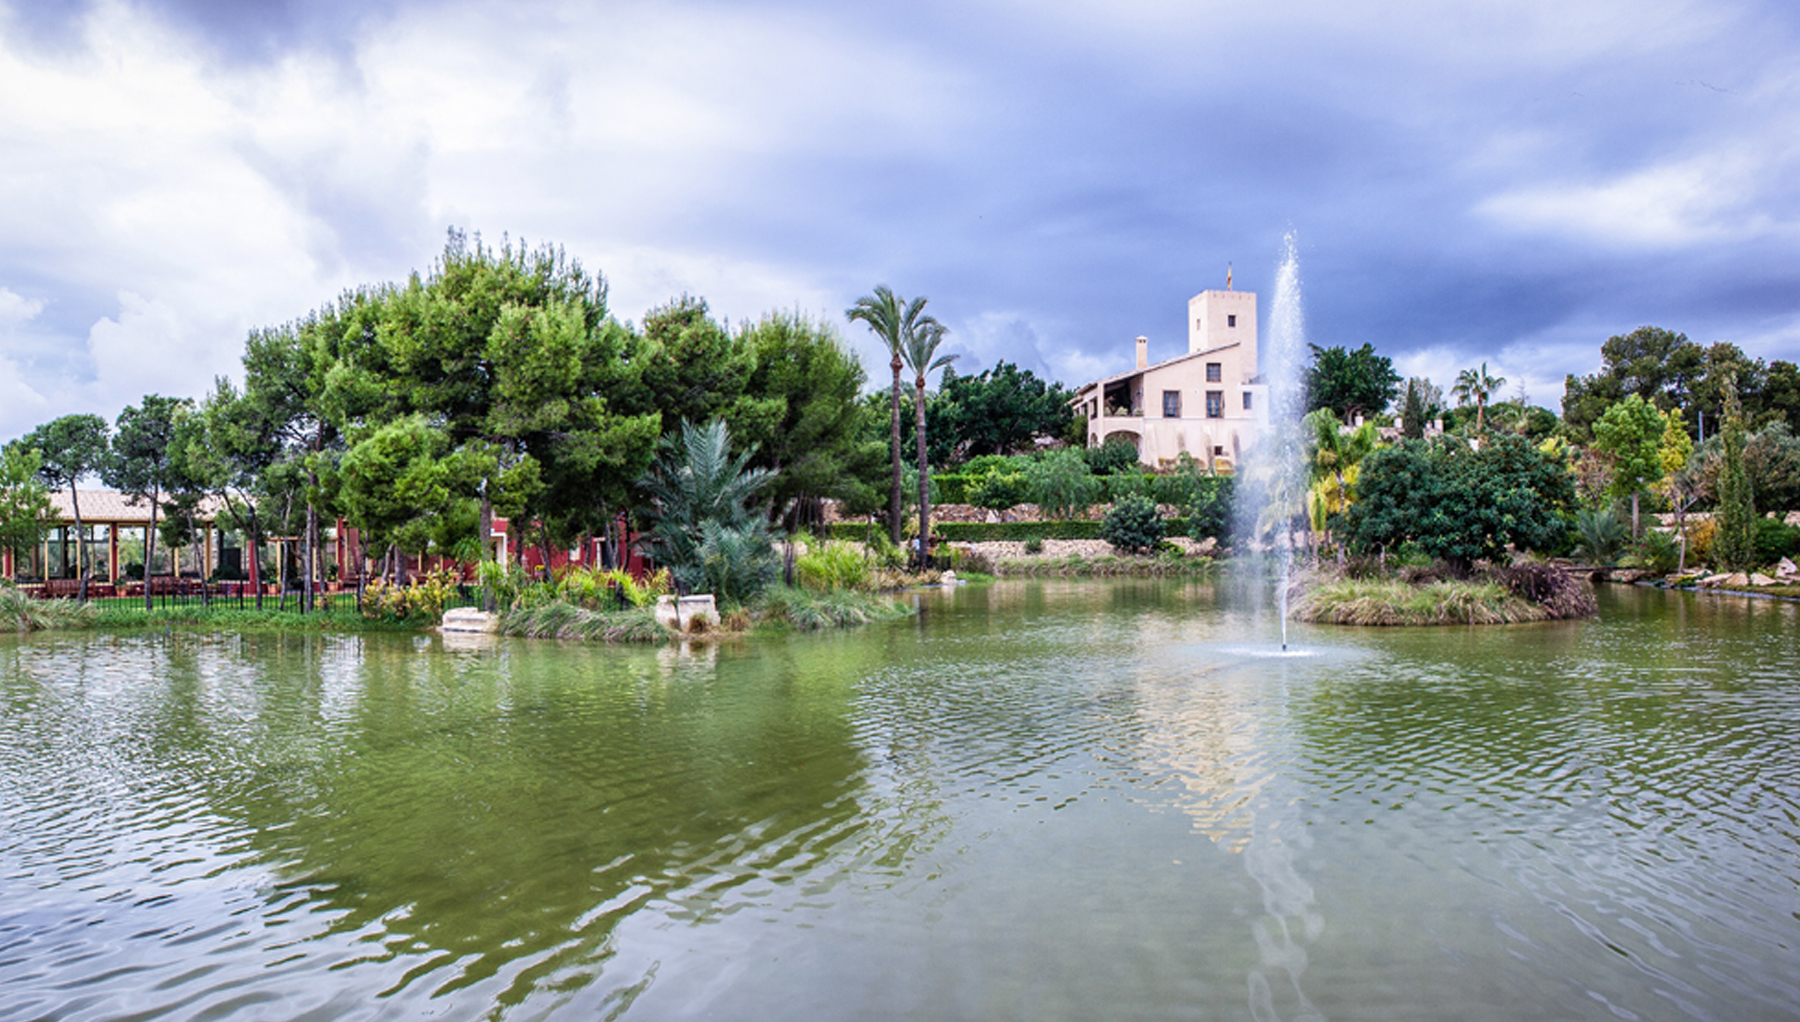 Diseno de jardines madrid david jim nez arquitectura y - Diseno jardines madrid ...